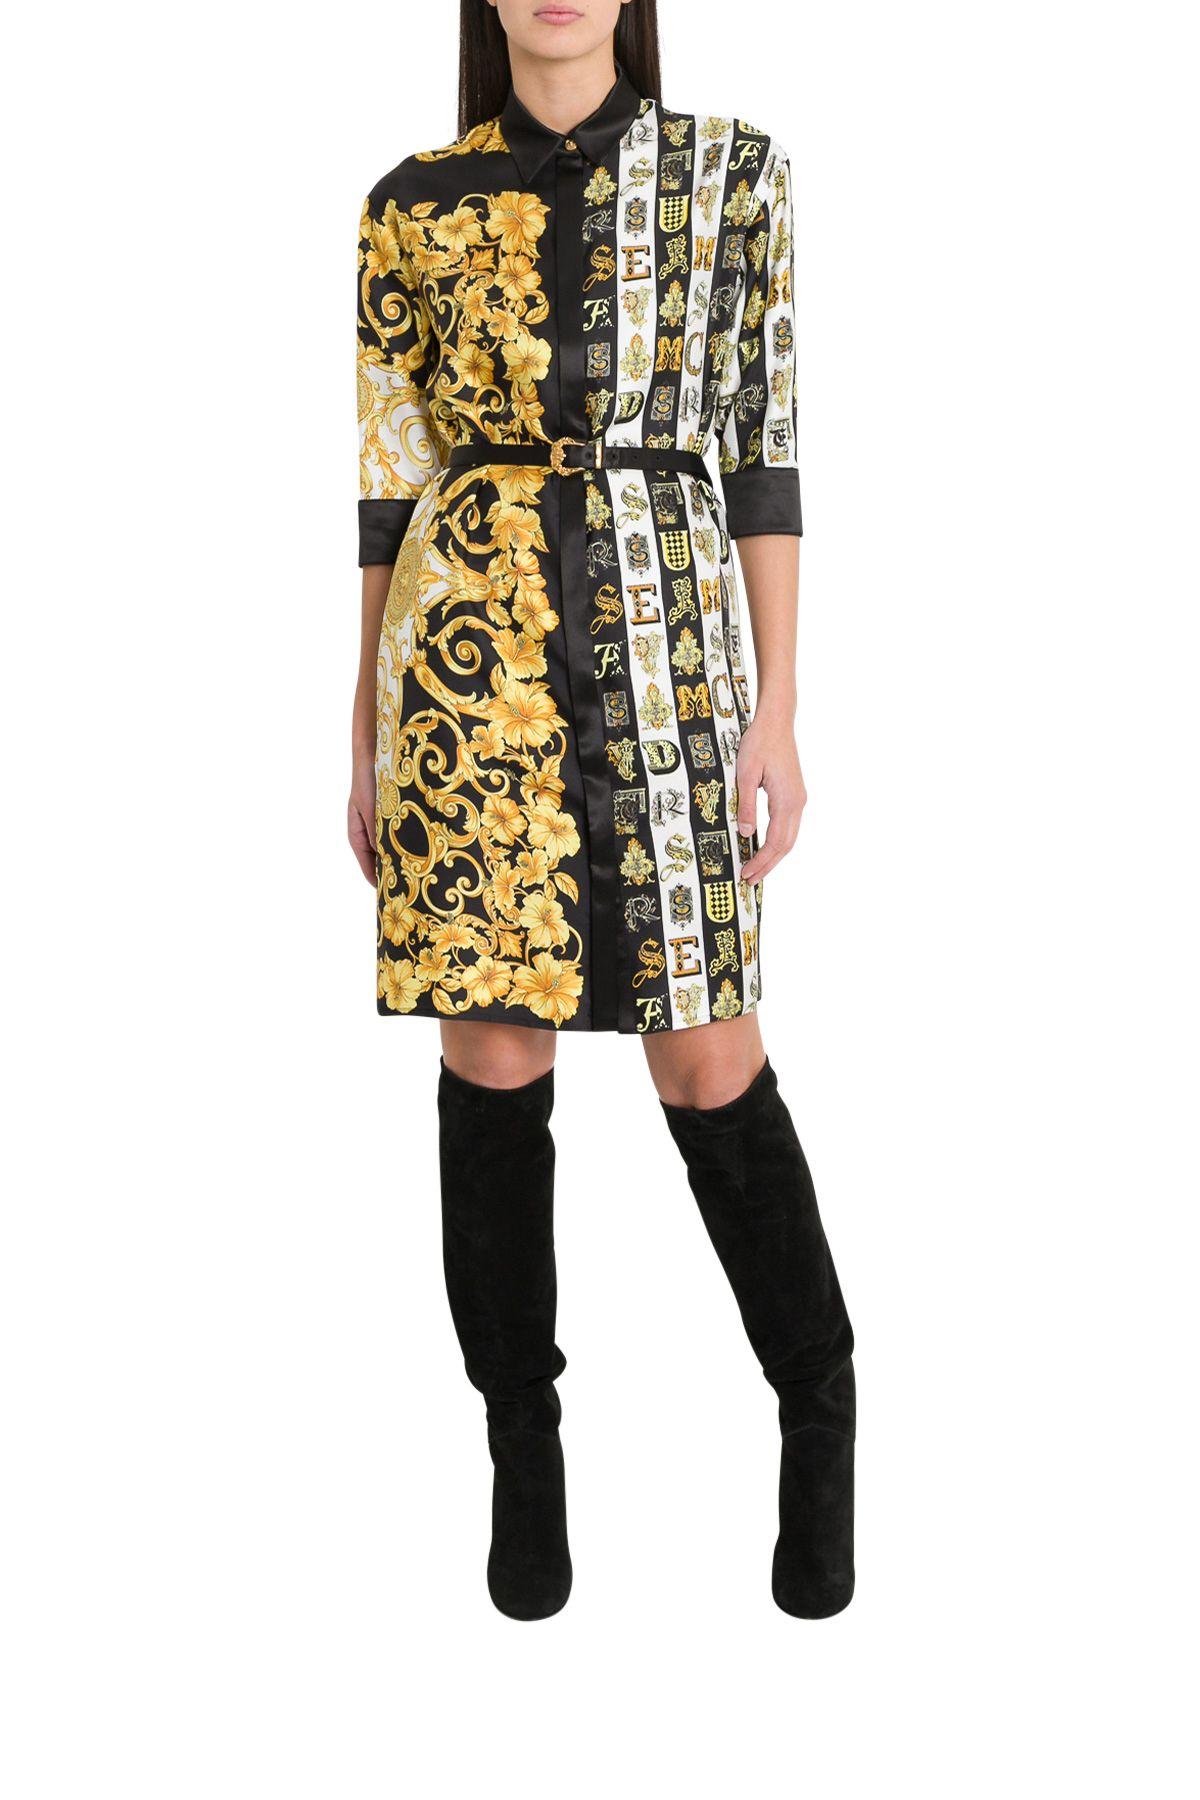 0e39b9f6fe4 Versace Versace Mixed Print Satin Shirt Dress - Multi - 10802270 ...